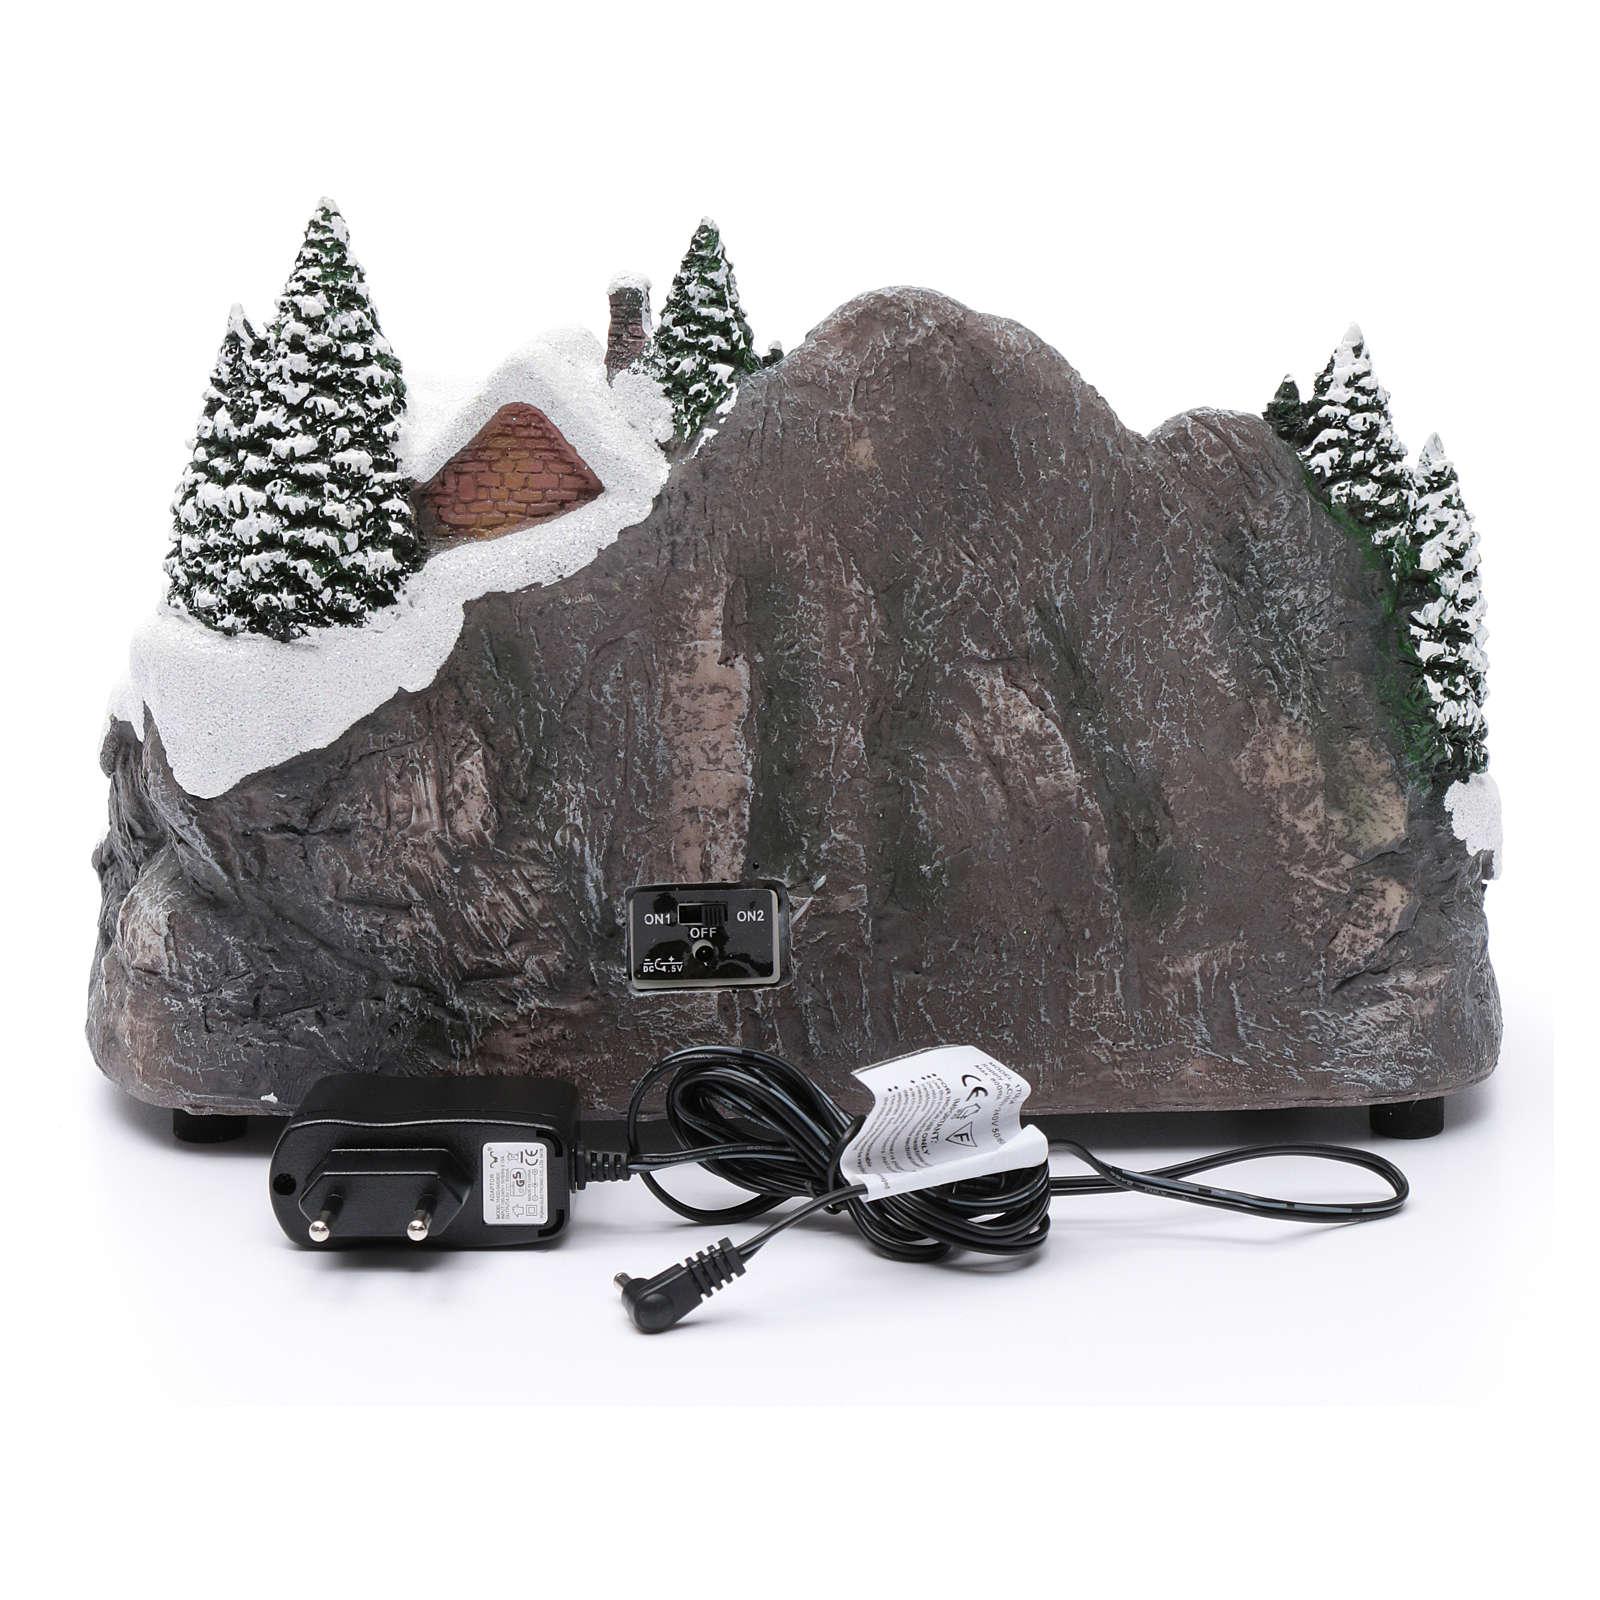 Aldea navideña iluminado musical movimiento árbol navidad 19x31x20 cm 3